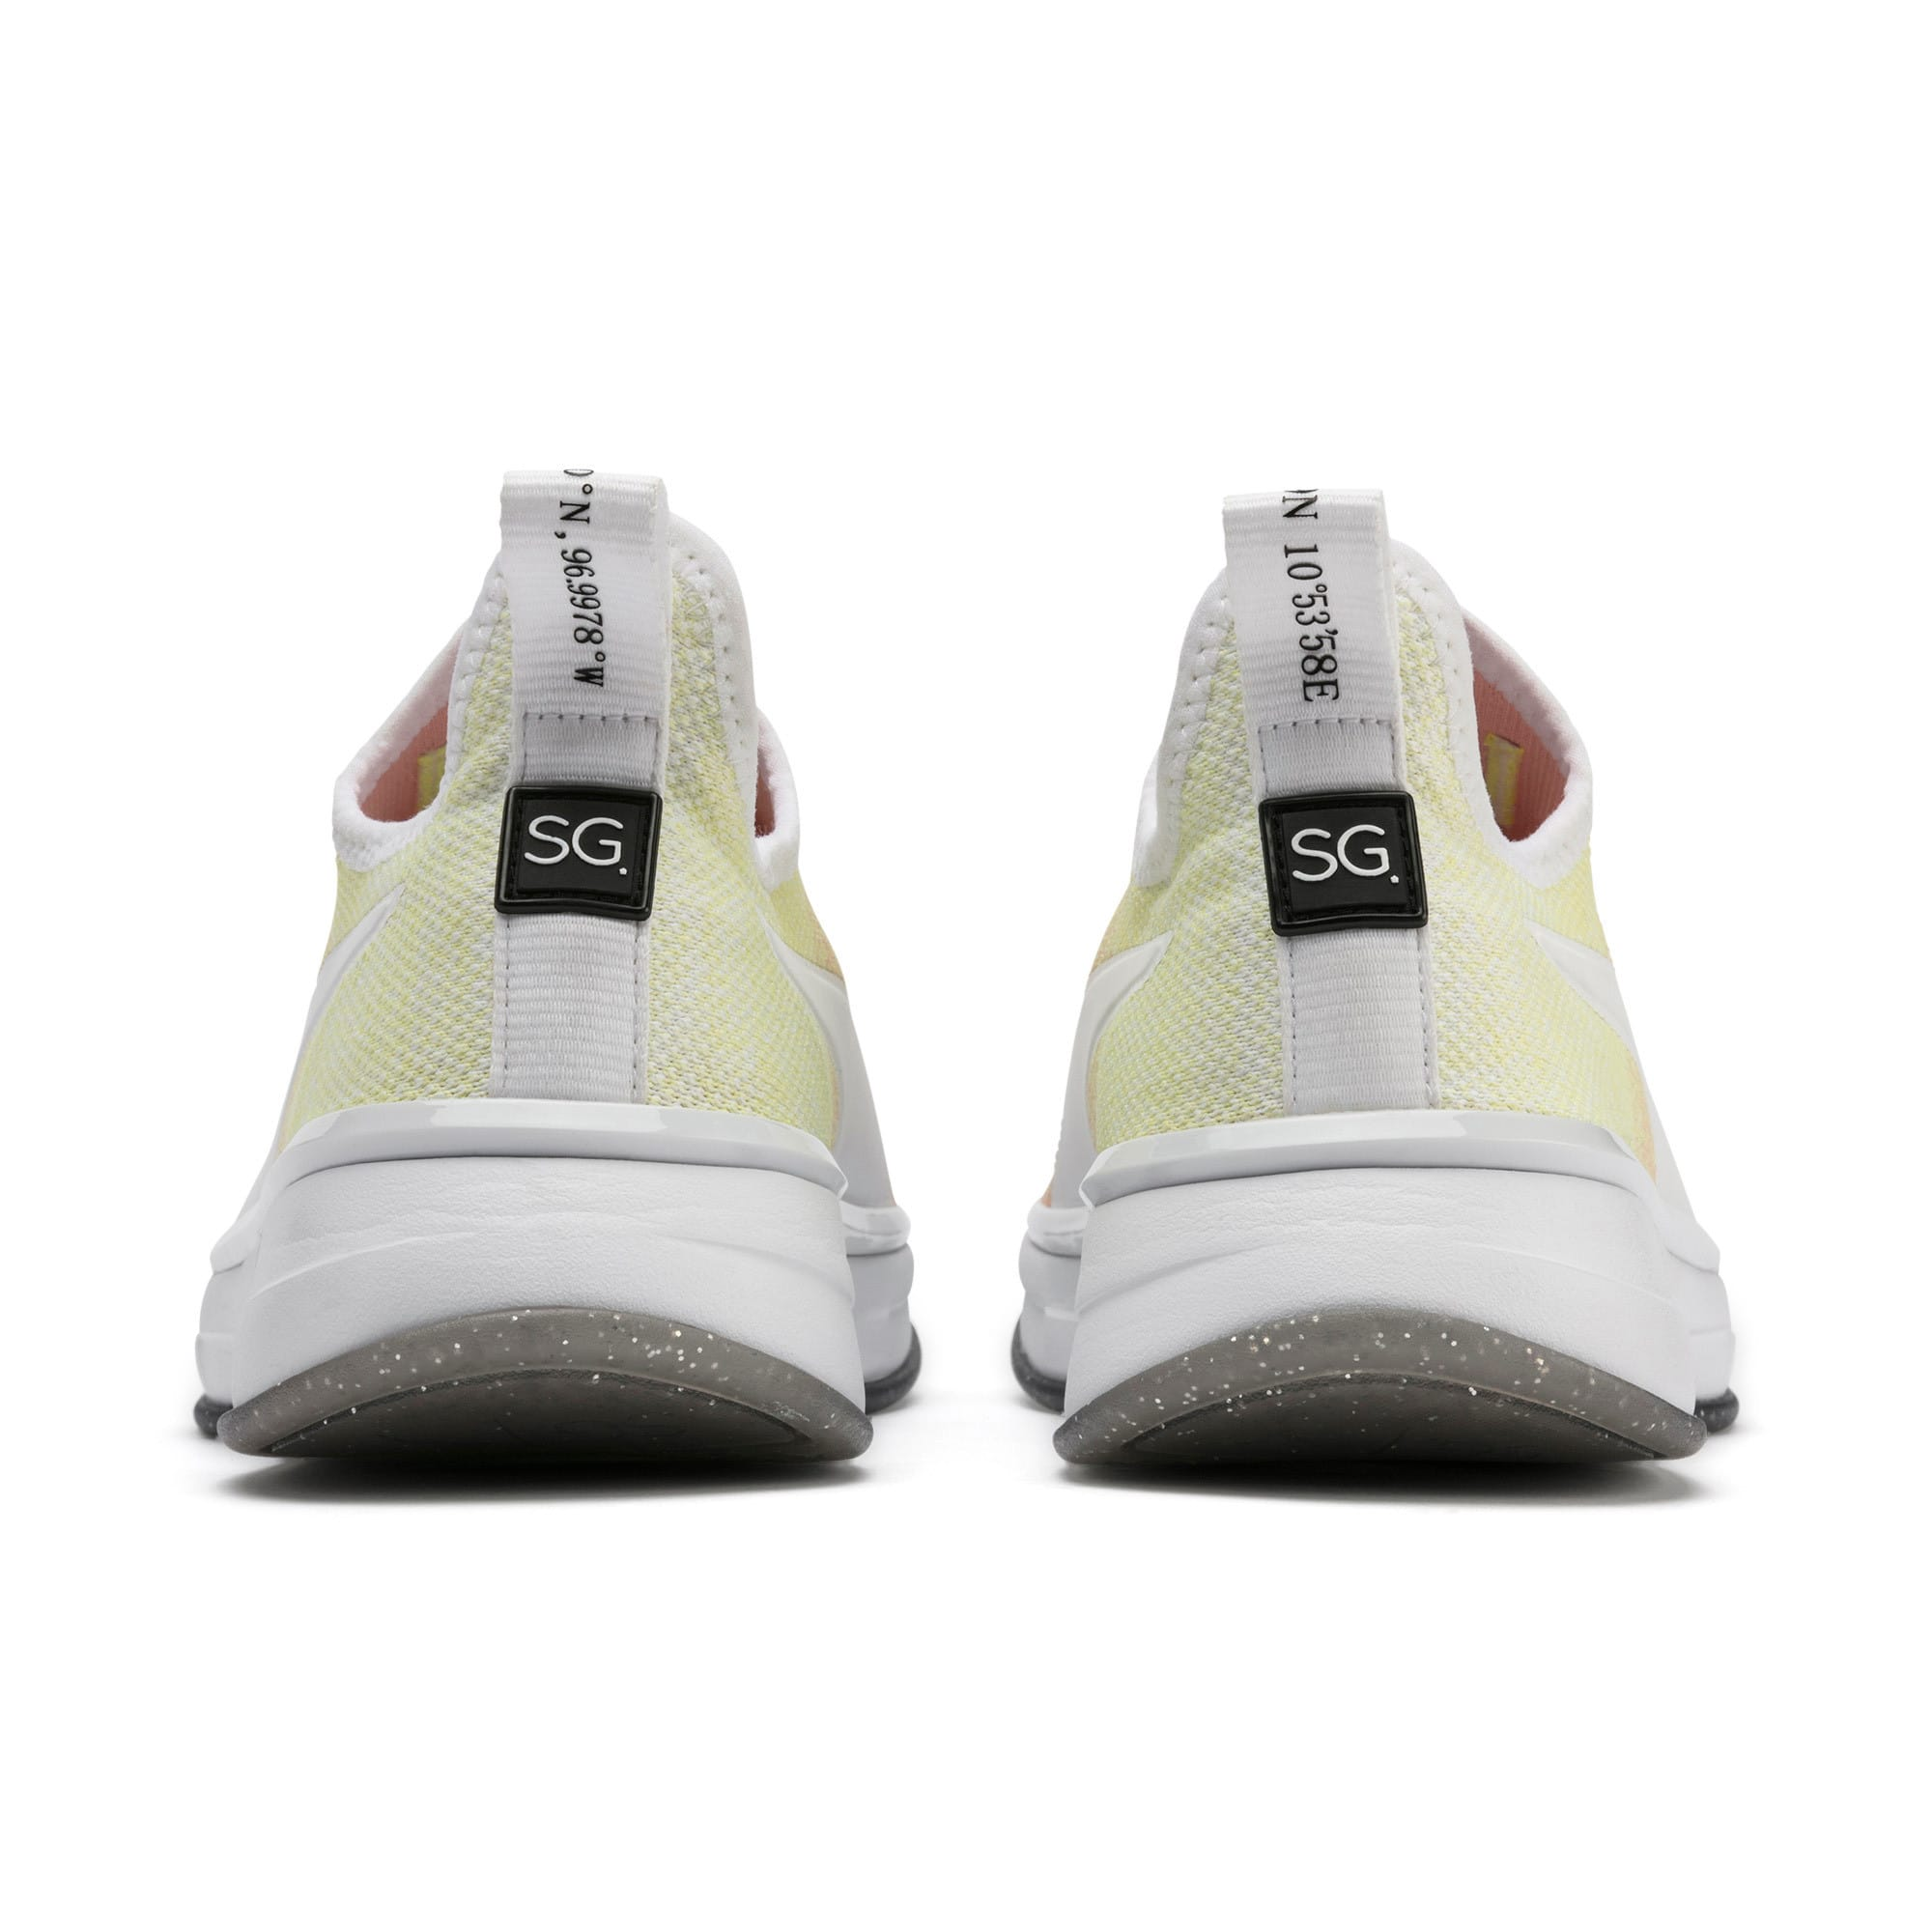 Thumbnail 4 of PUMA x SELENA GOMEZ Slip-On Gradient Women's Training Shoes, YELLOW-Peach Bud-White, medium